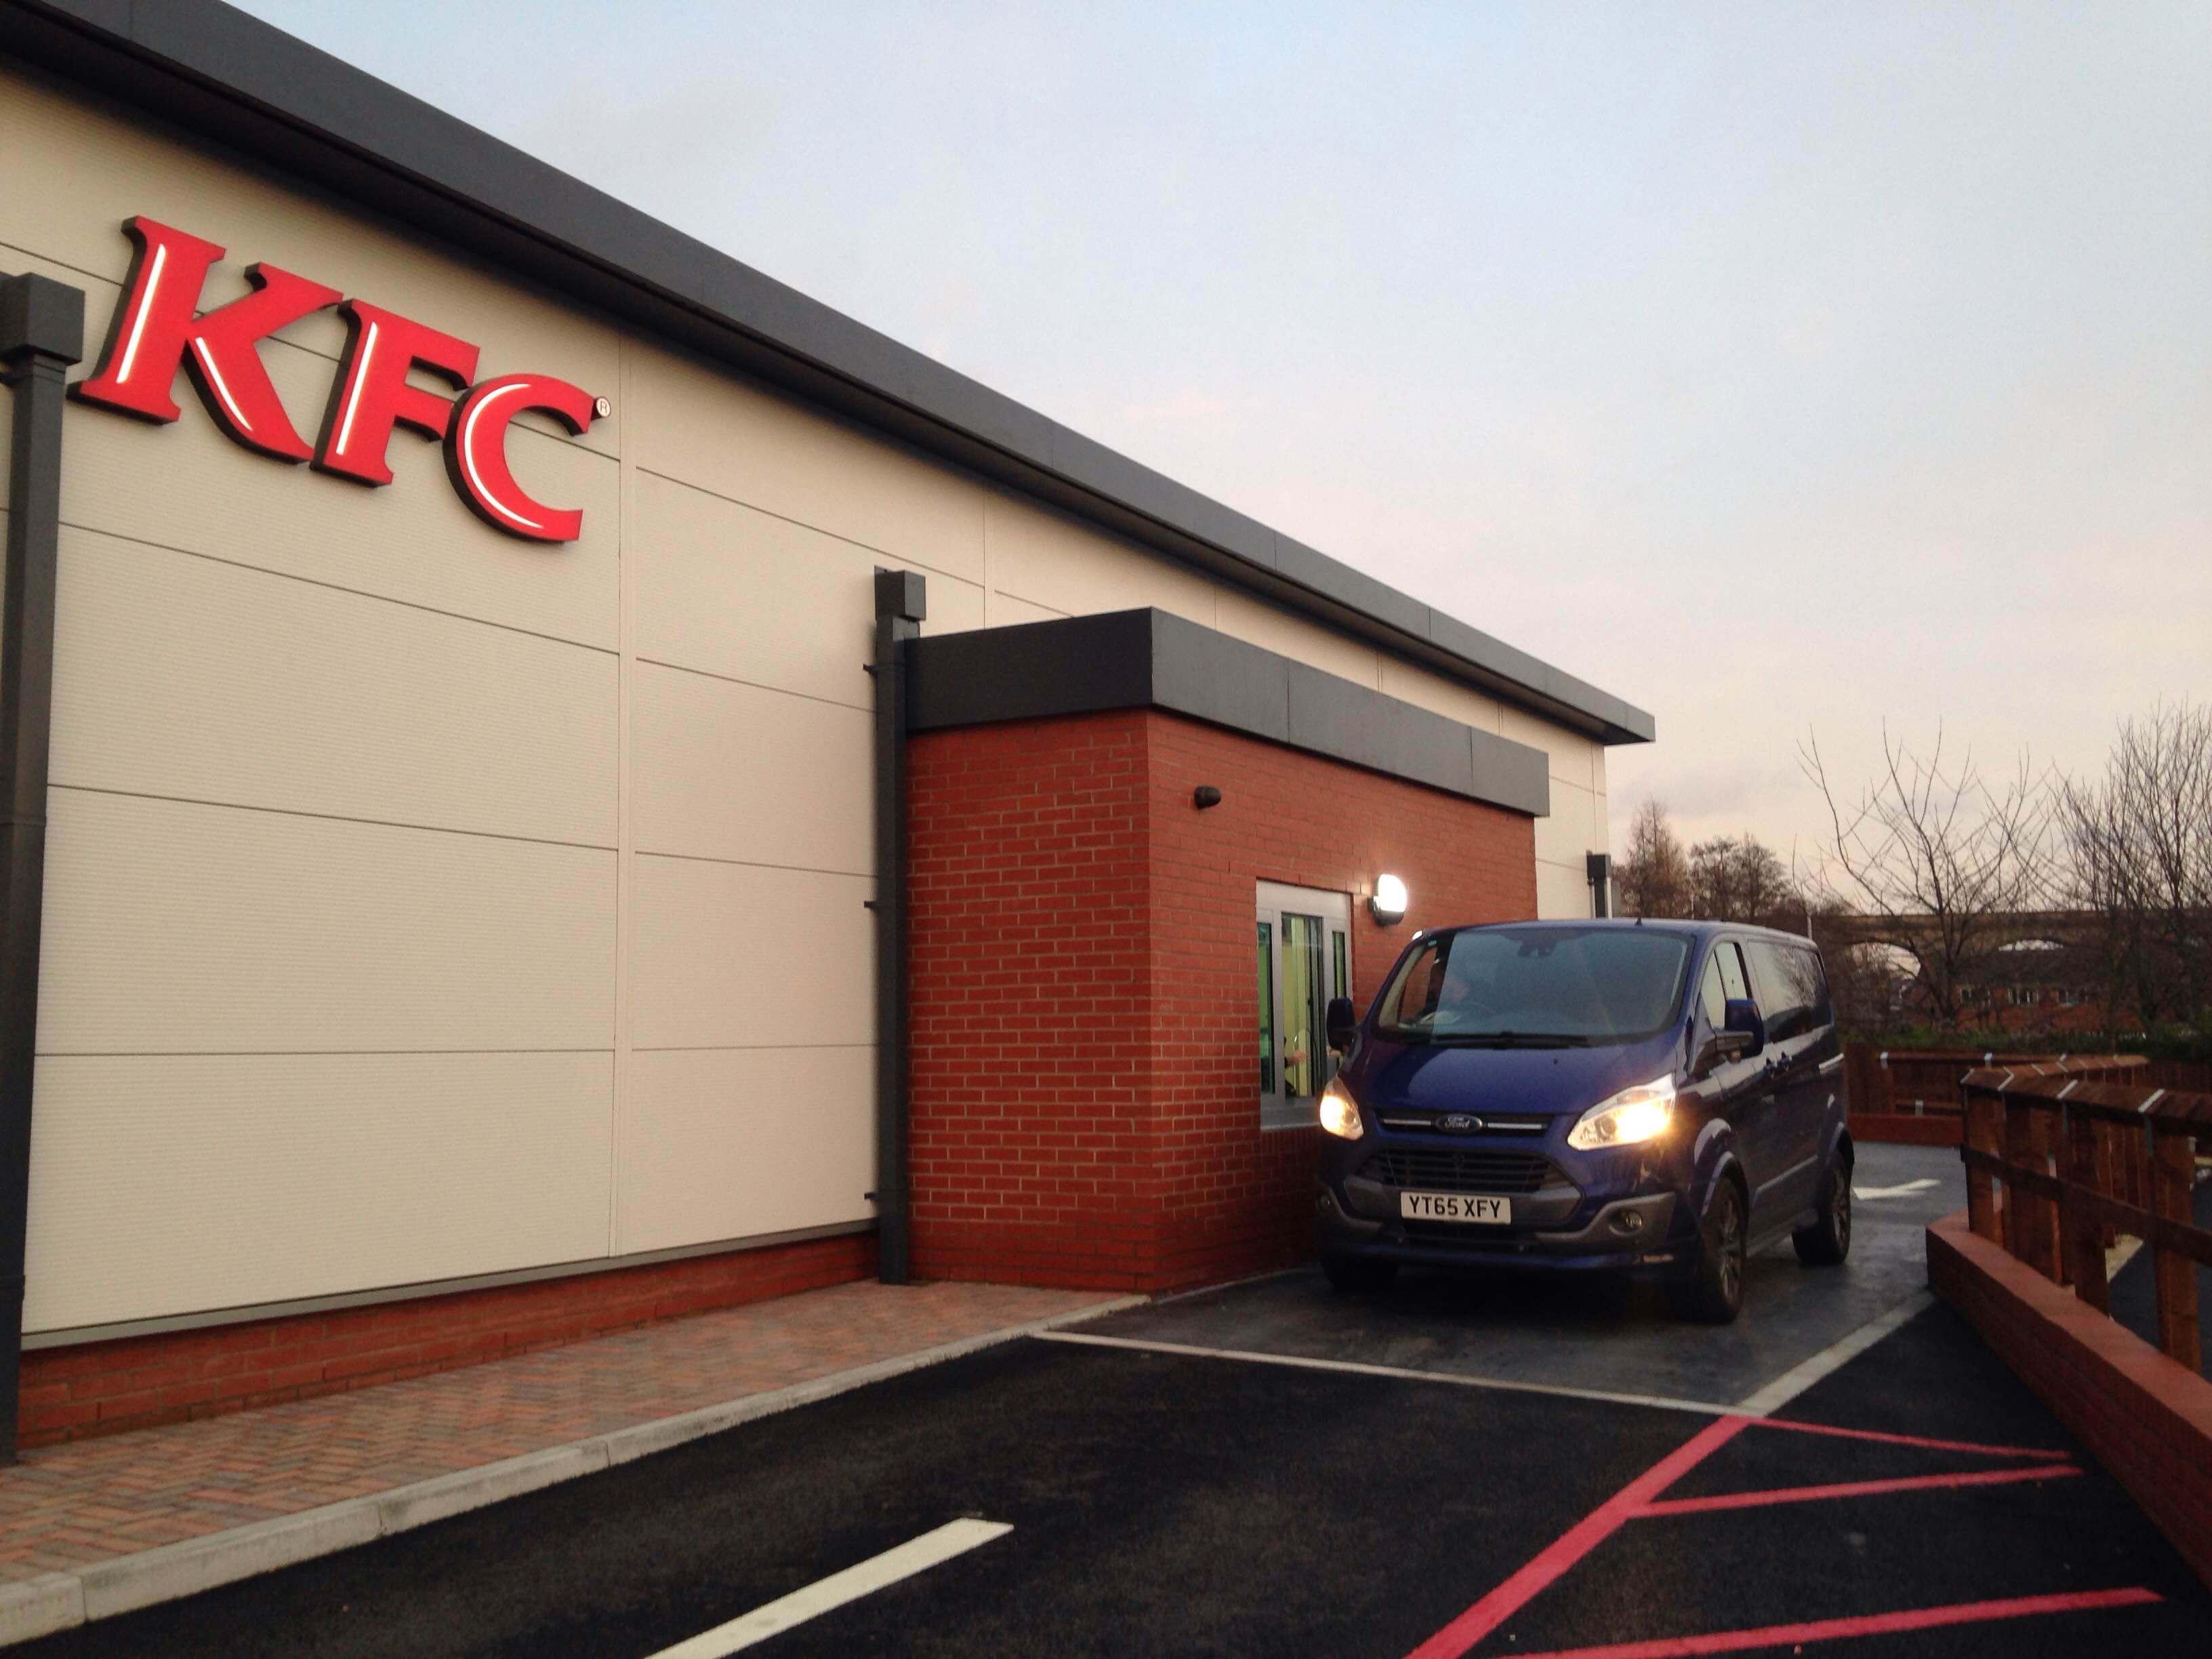 KFC Drive Thru installation